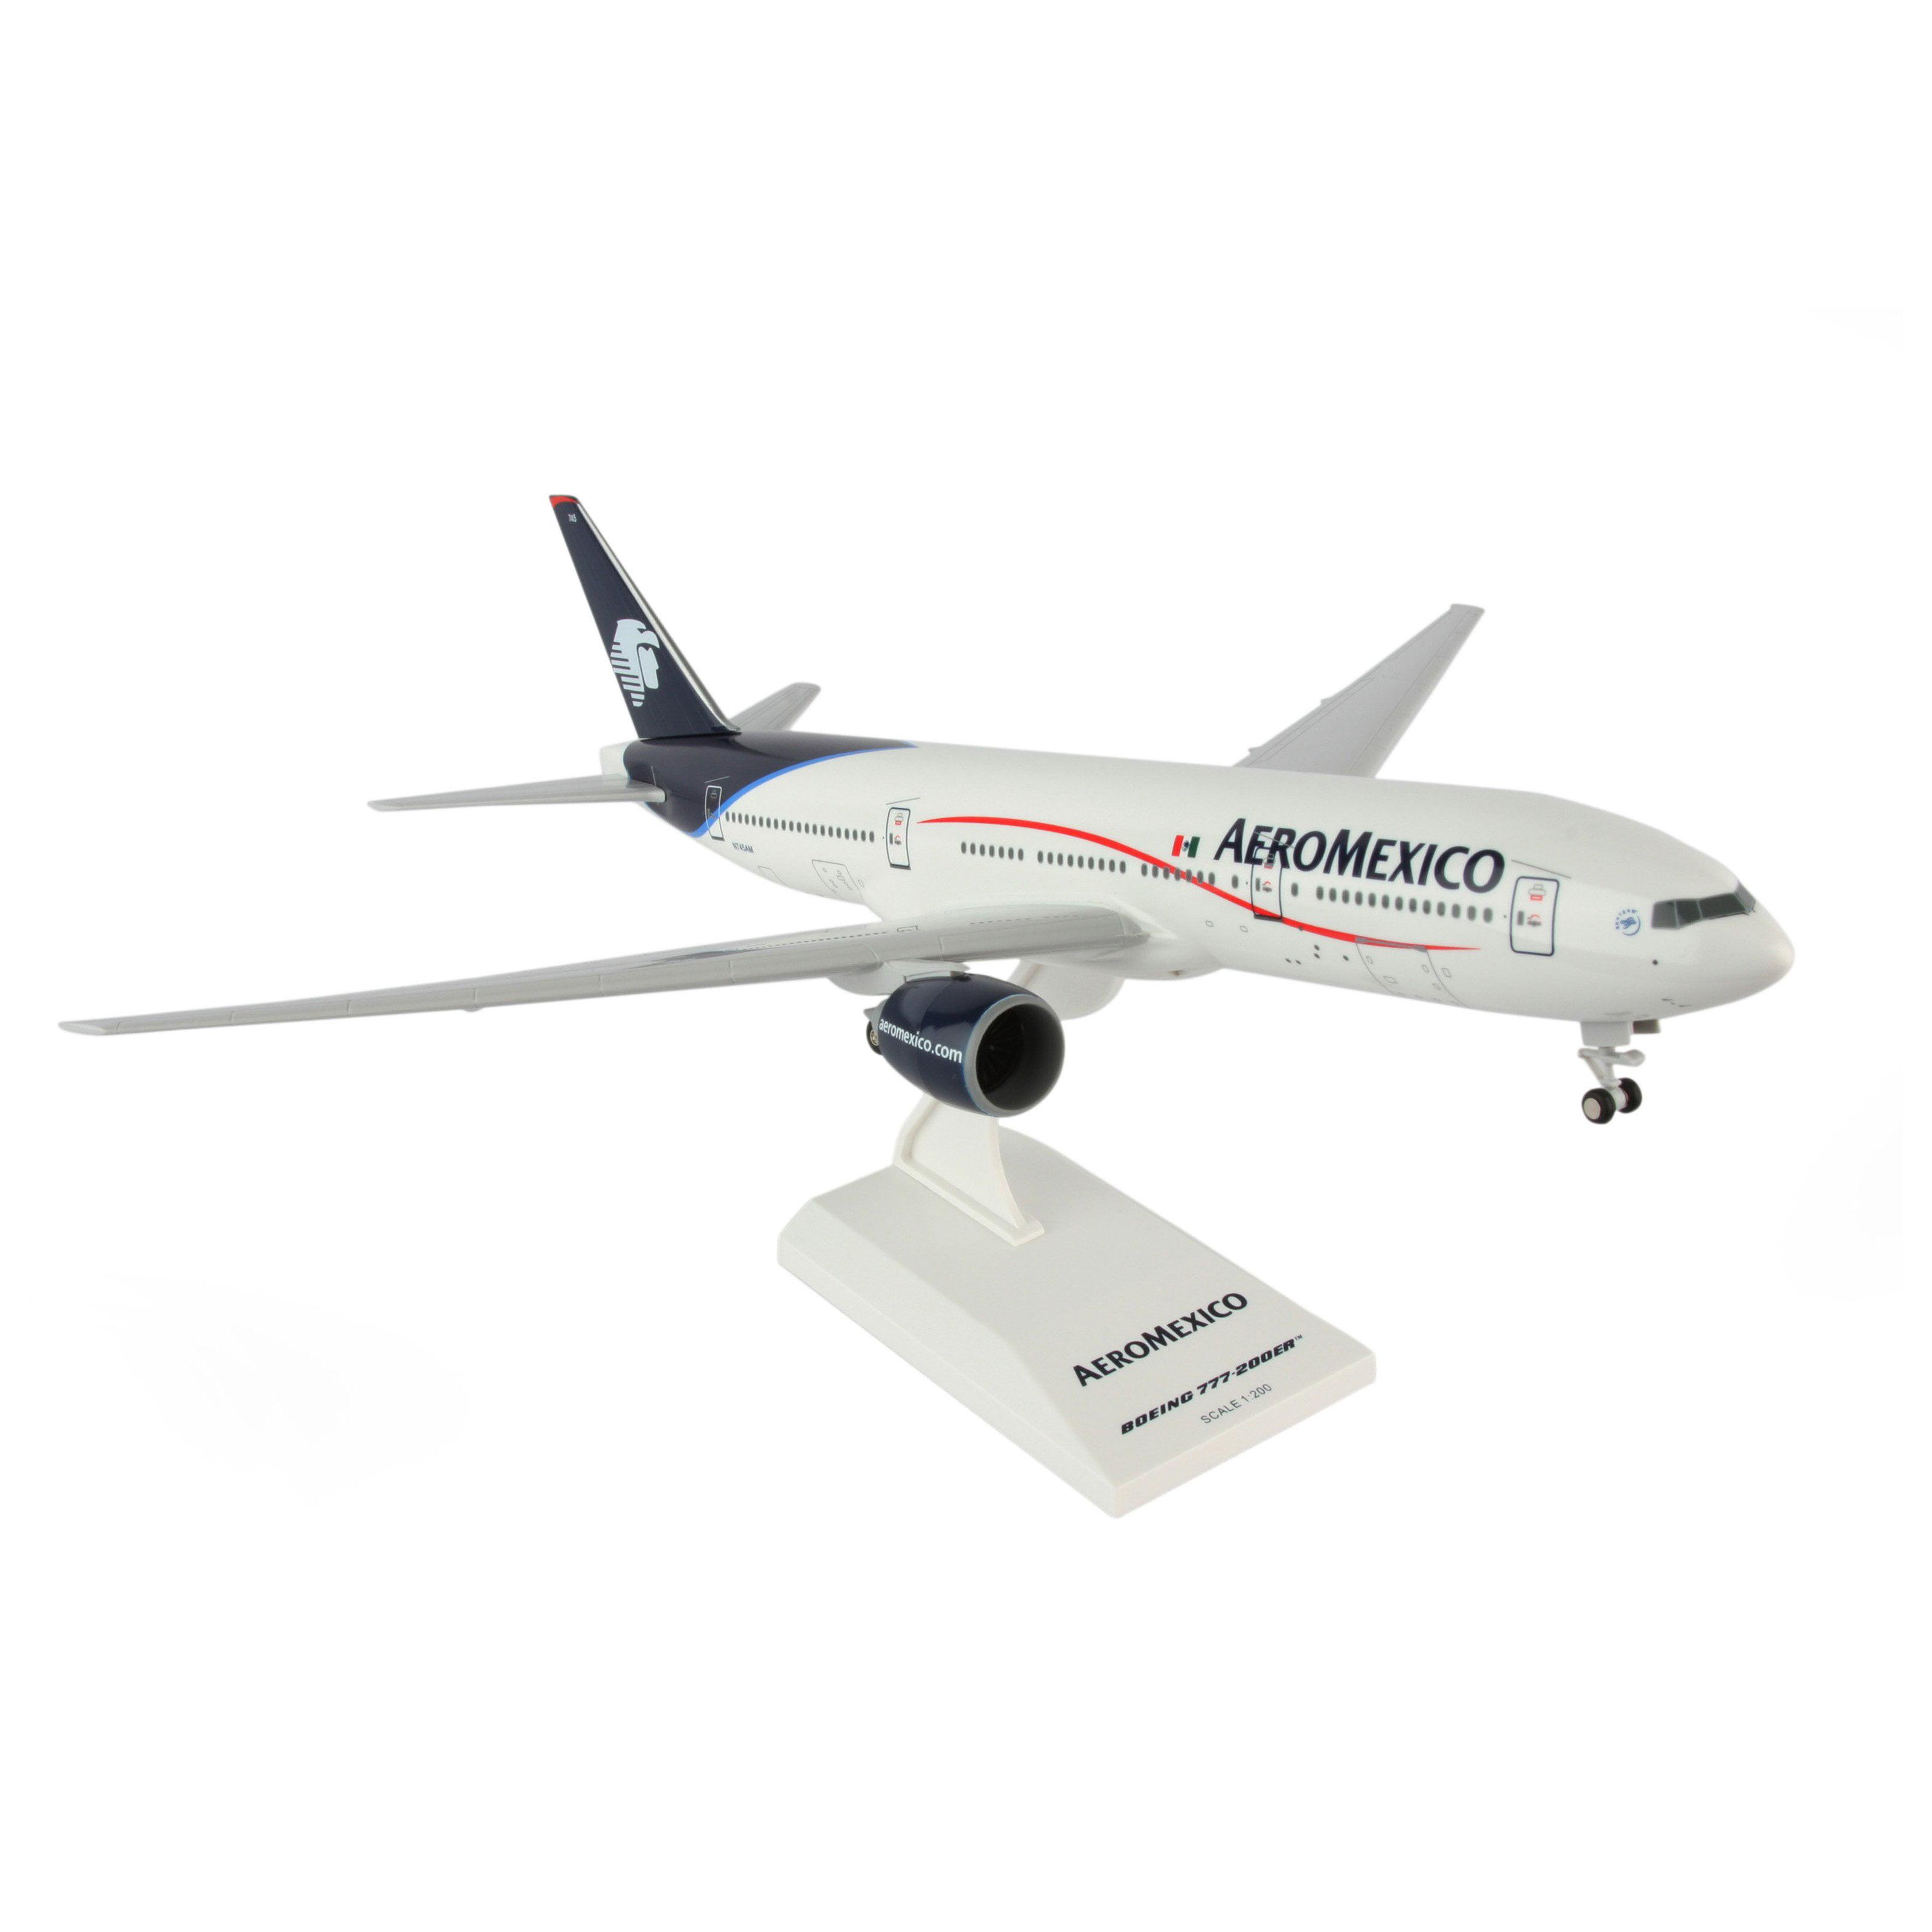 Skymarks Aeromexico 777-200ER 1 200 with Gear Model Airplane by DARON